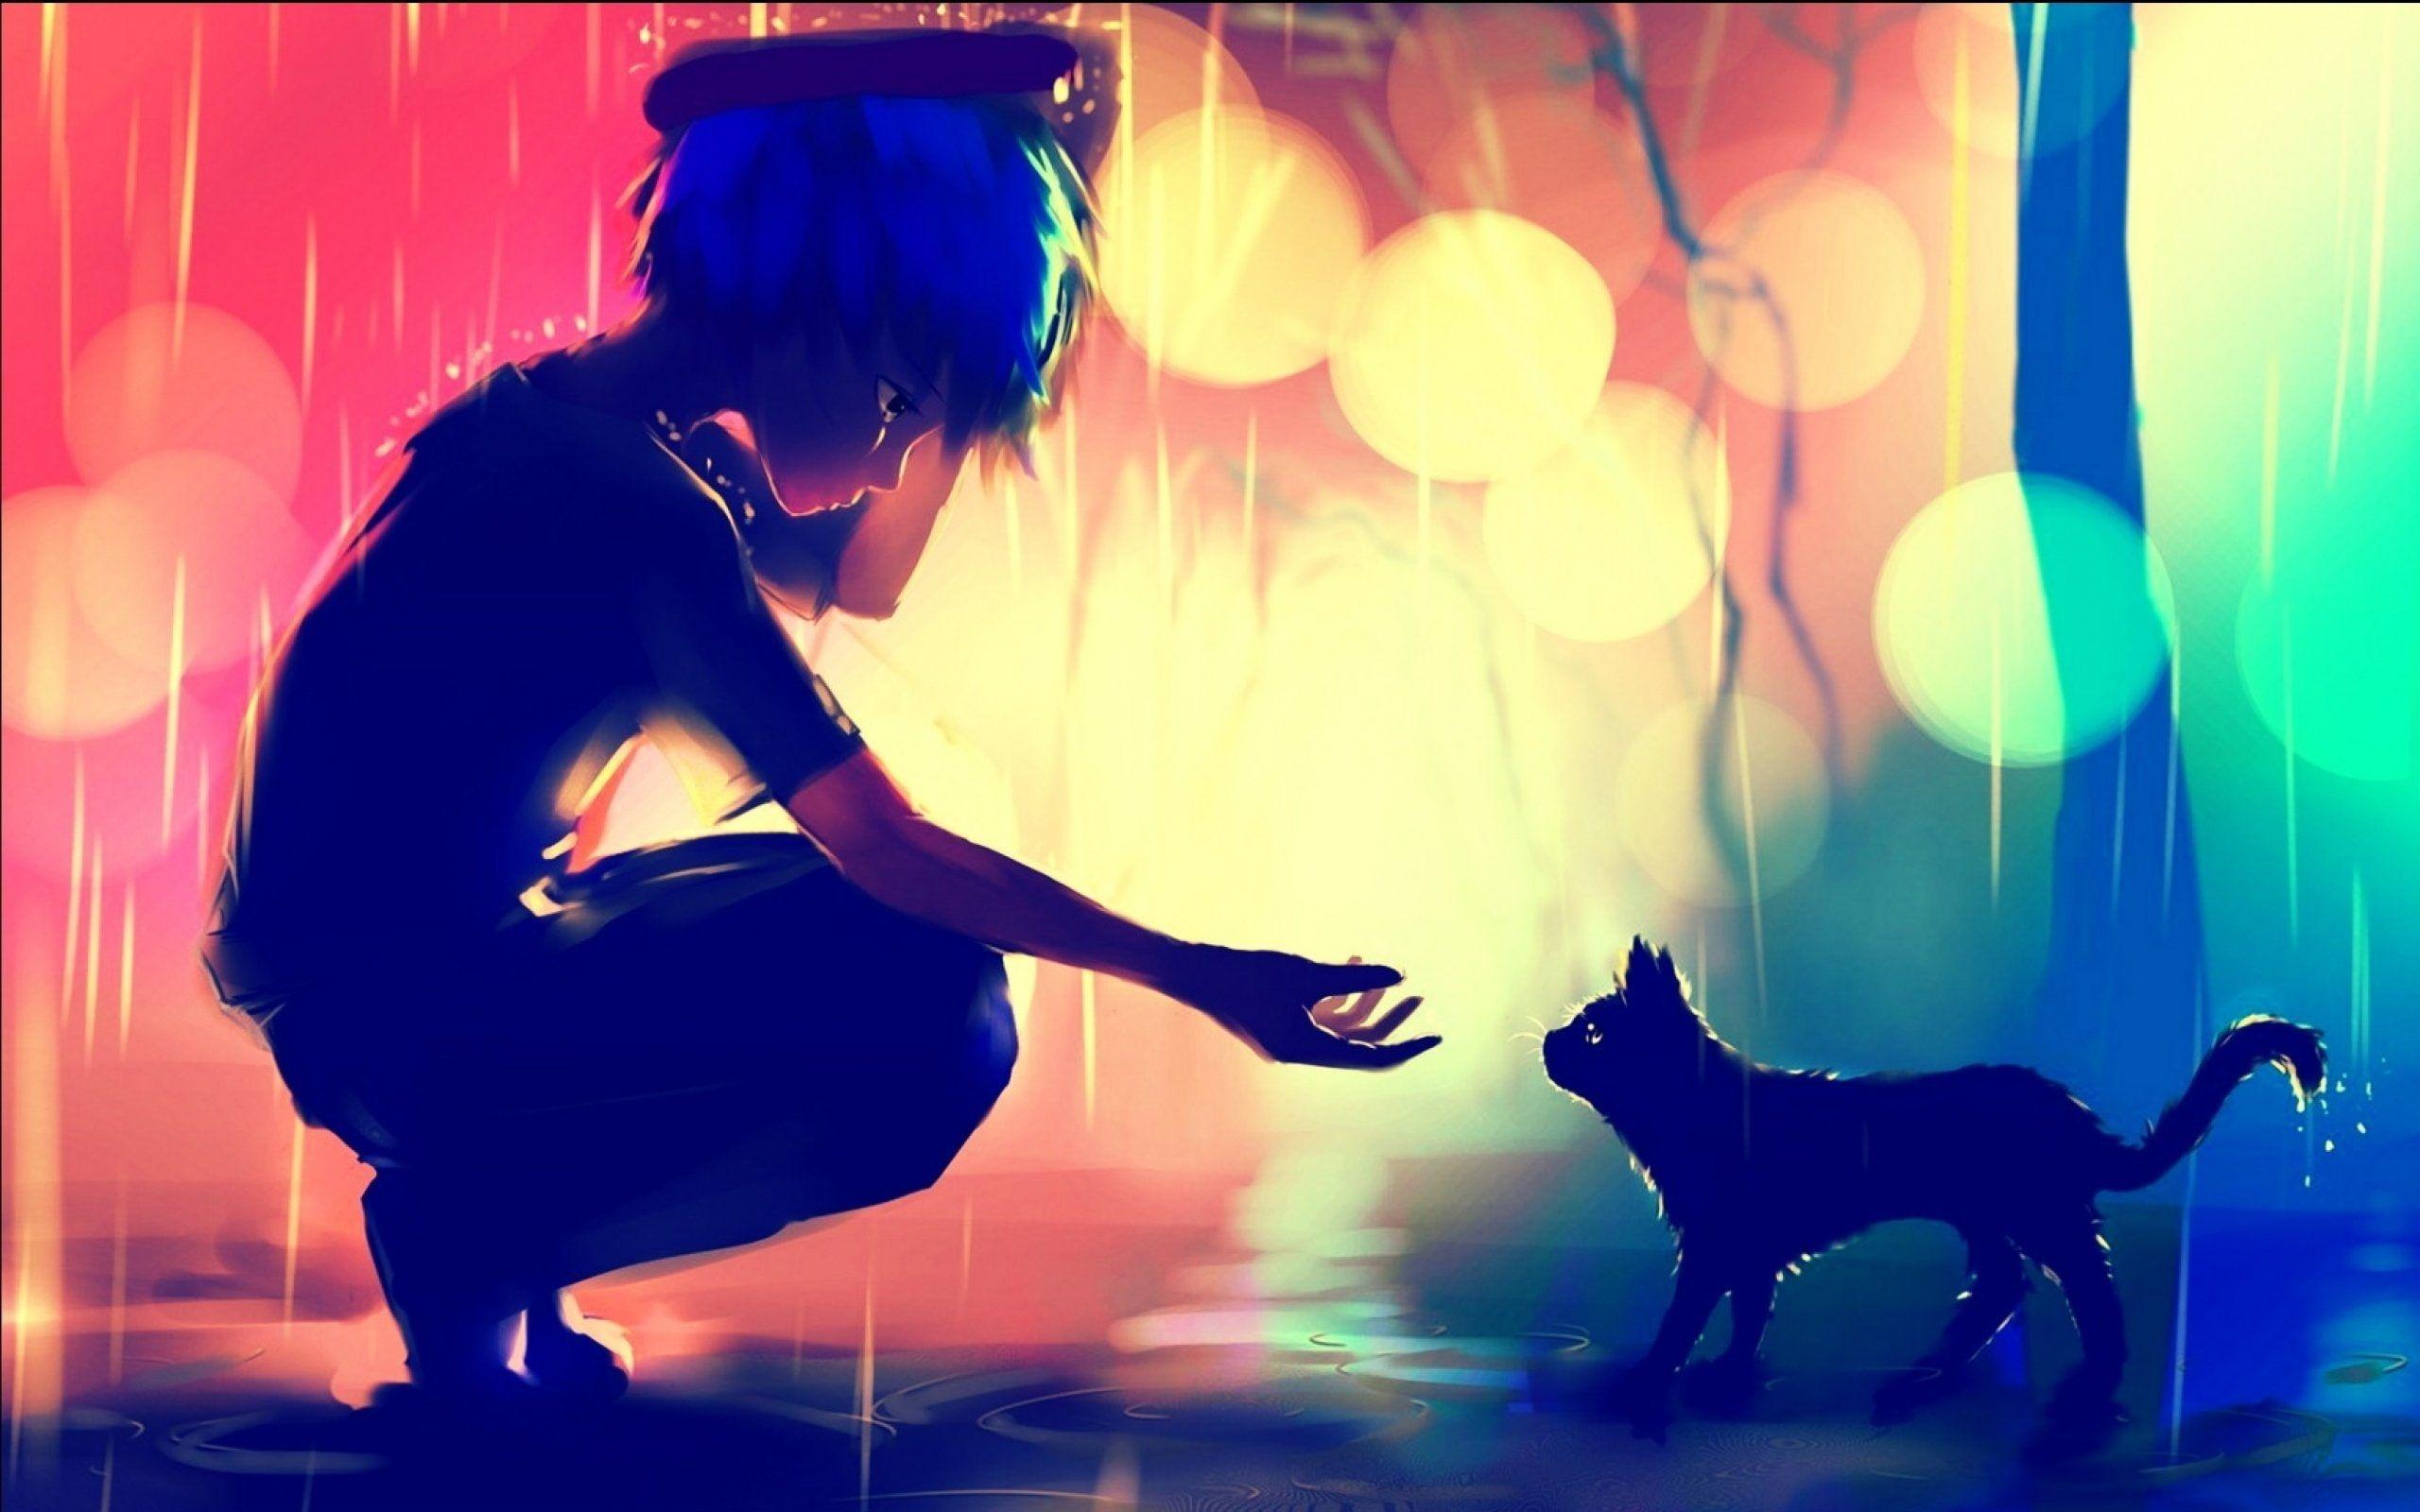 Anime Boy Cat Sadness Profile View Bokeh Raining Domestic Wallpaper Anime Scenery Wallpaper Anime Wallpaper Anime Scenery